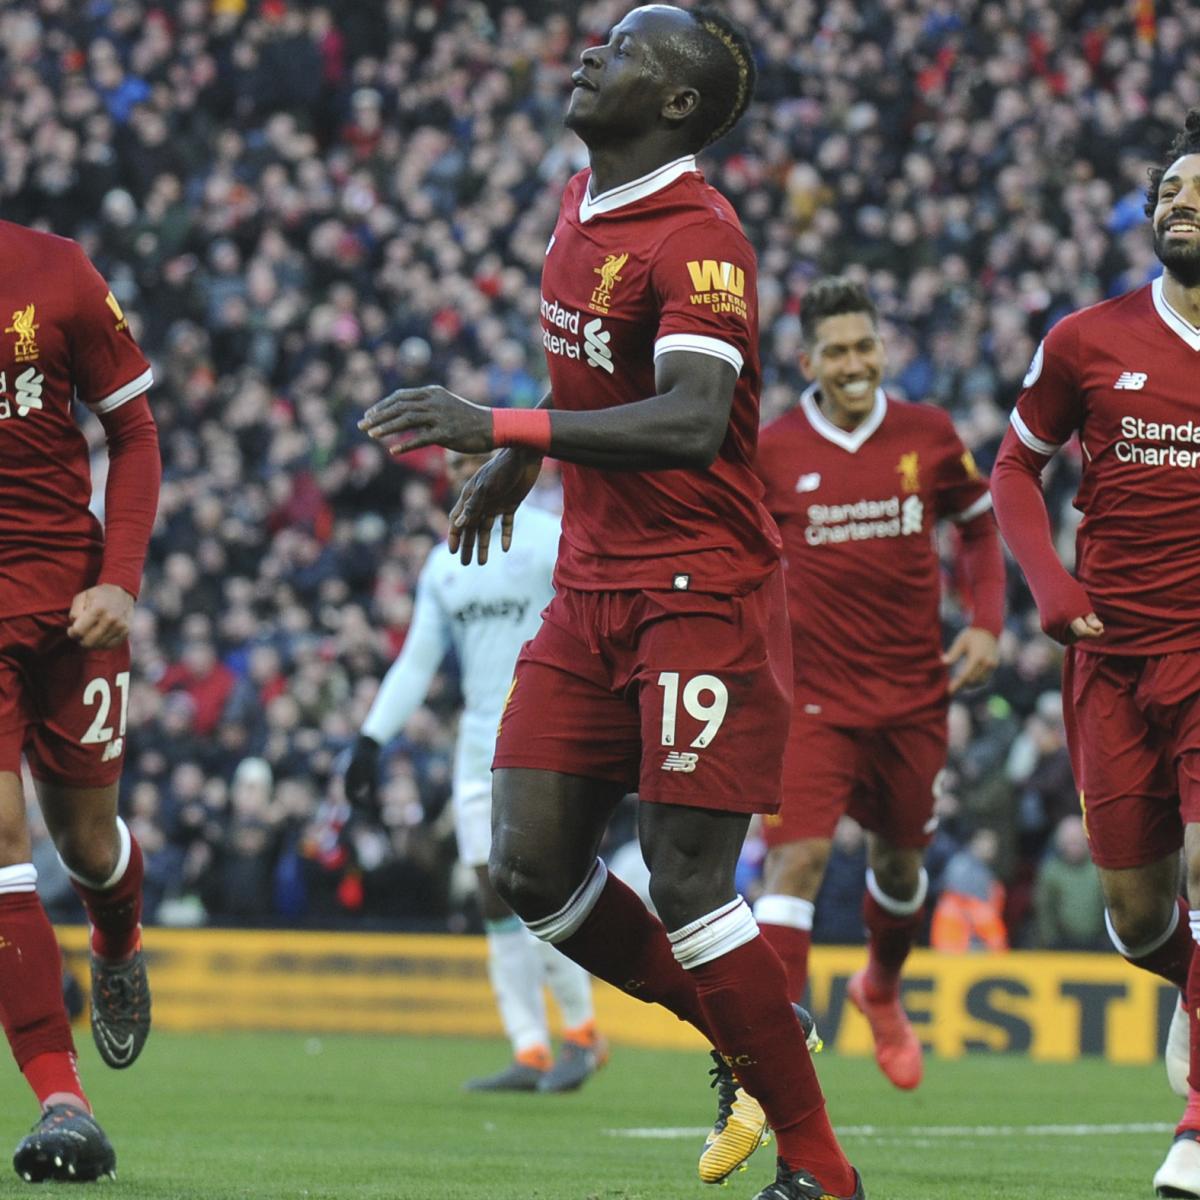 Live Streaming Soccer News Liverpool Vs Benfica Live: Liverpool Vs. Watford: Team News, Preview, Live Stream, TV